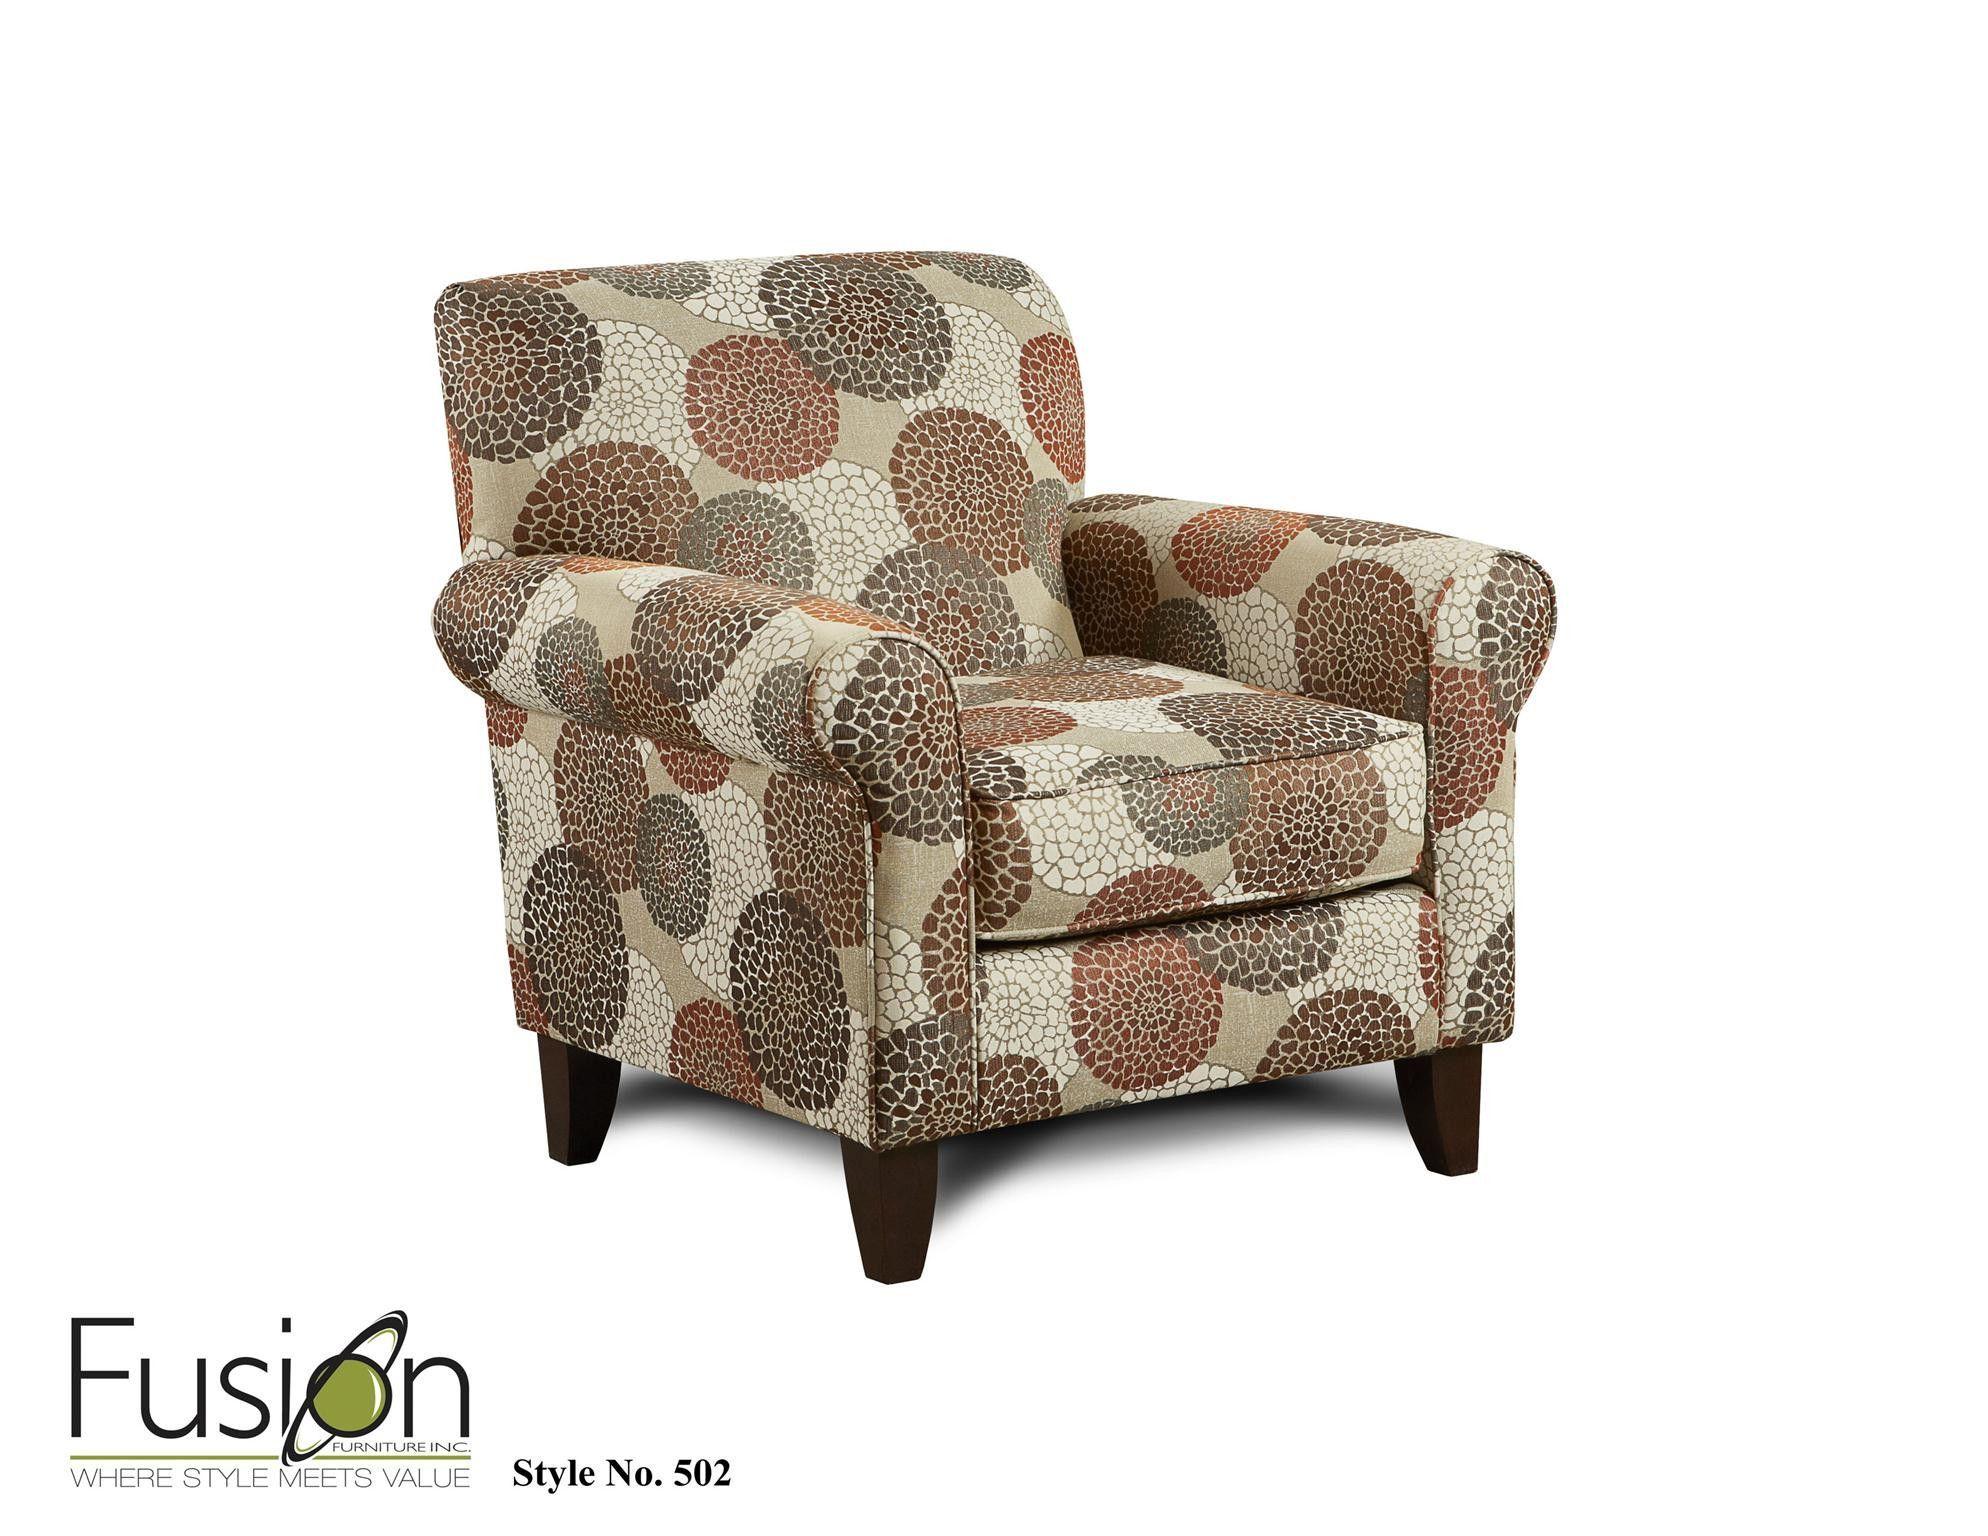 Fusion - 502 Cornell Chair